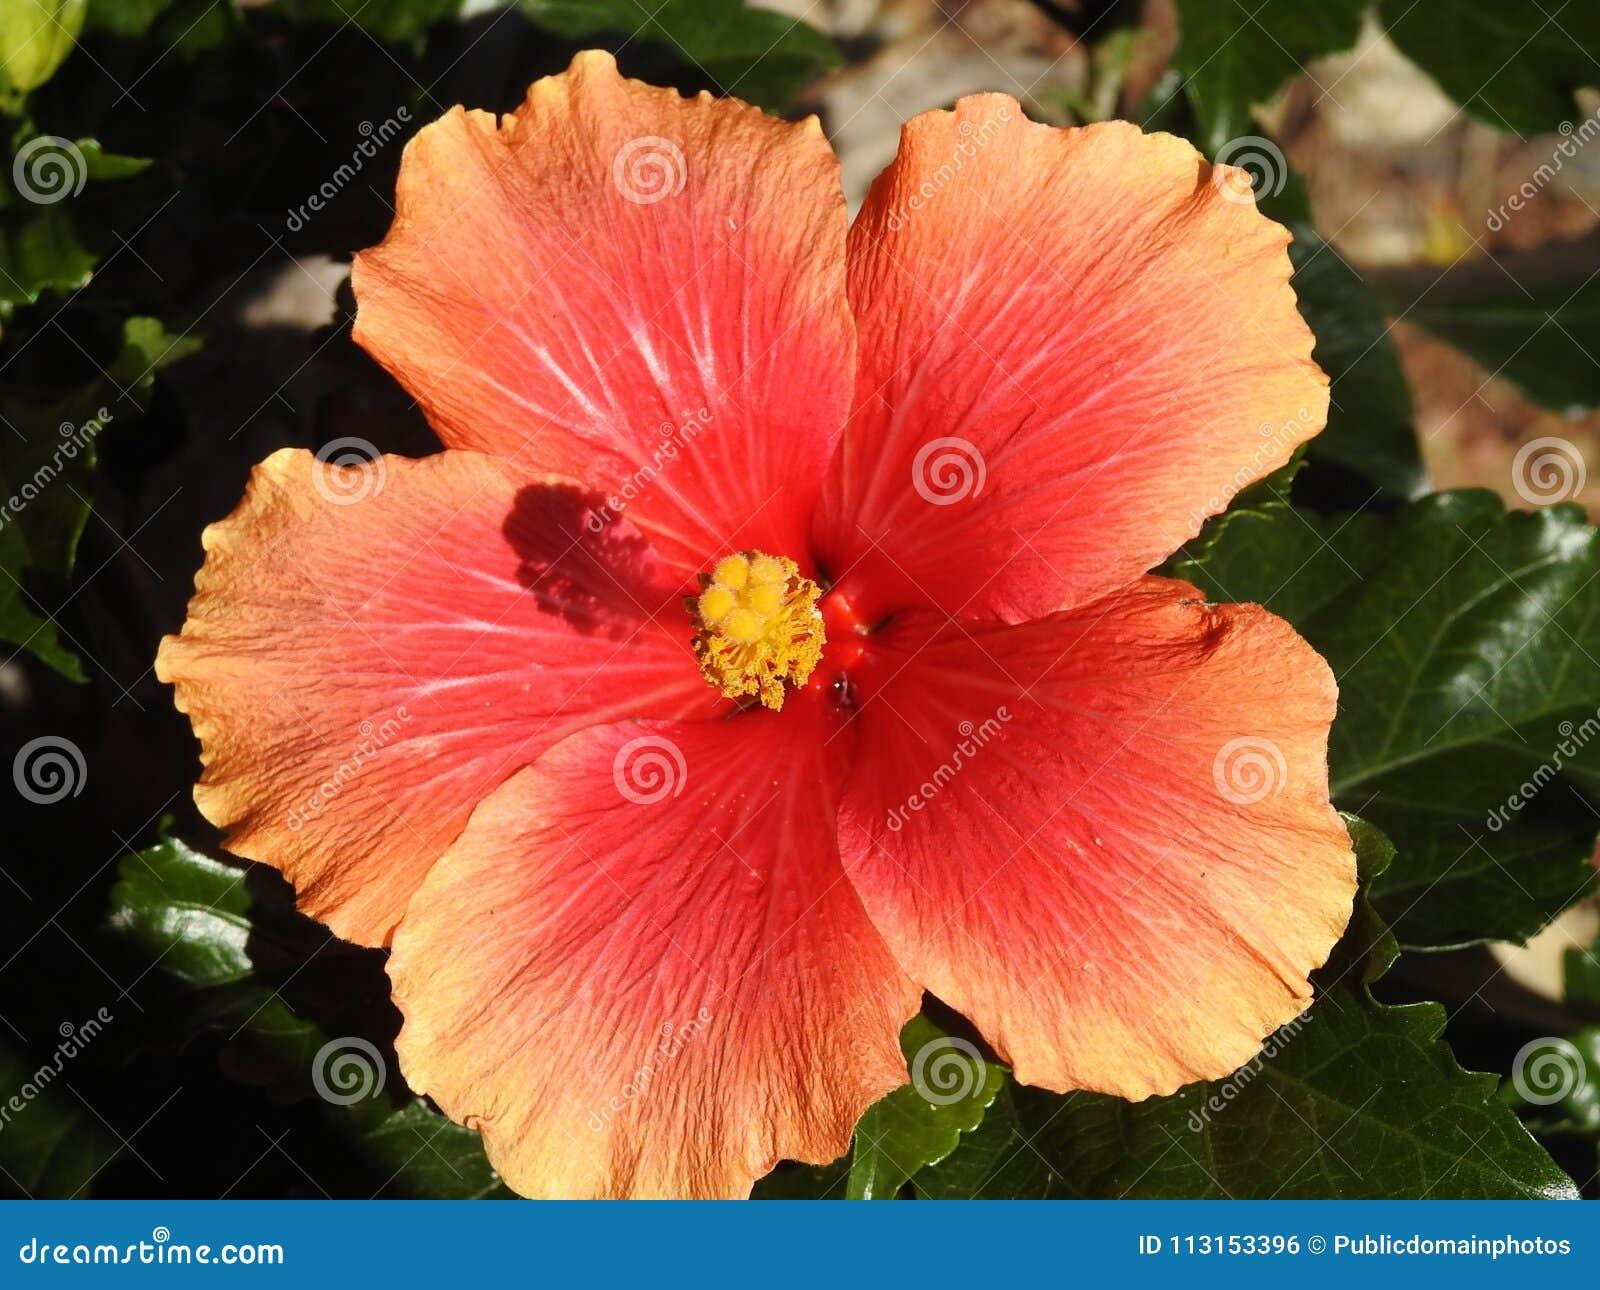 Free Public Domain Cc0 Image Flower Hibiscus Flowering Plant